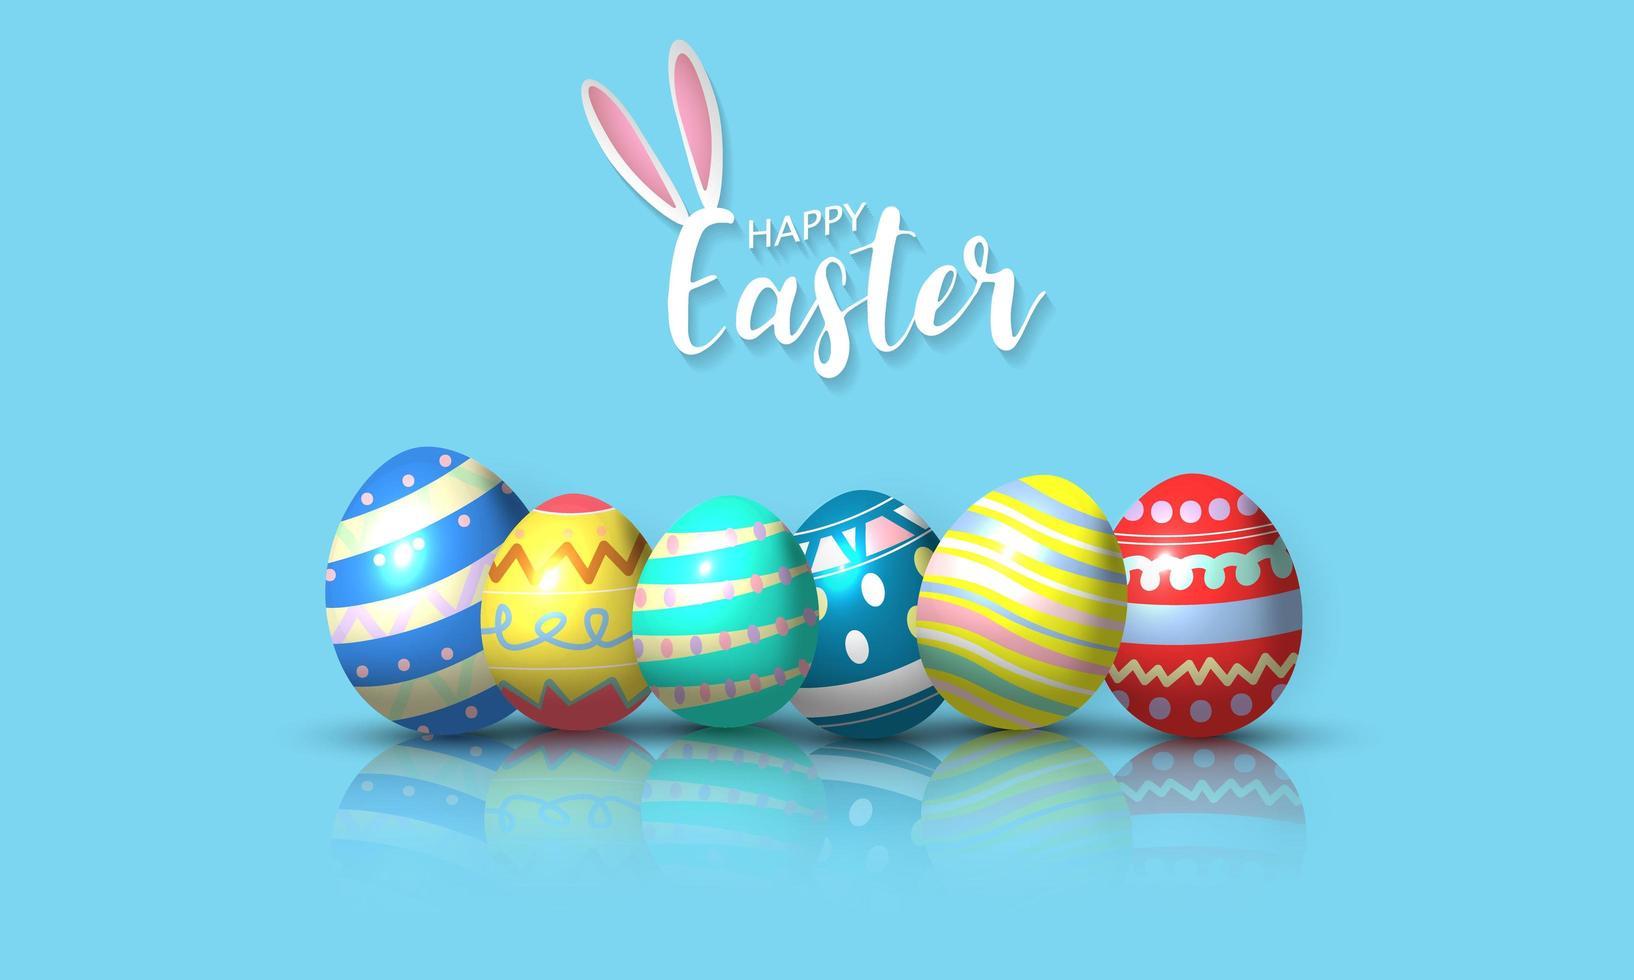 Happy Easter achtergrond vector